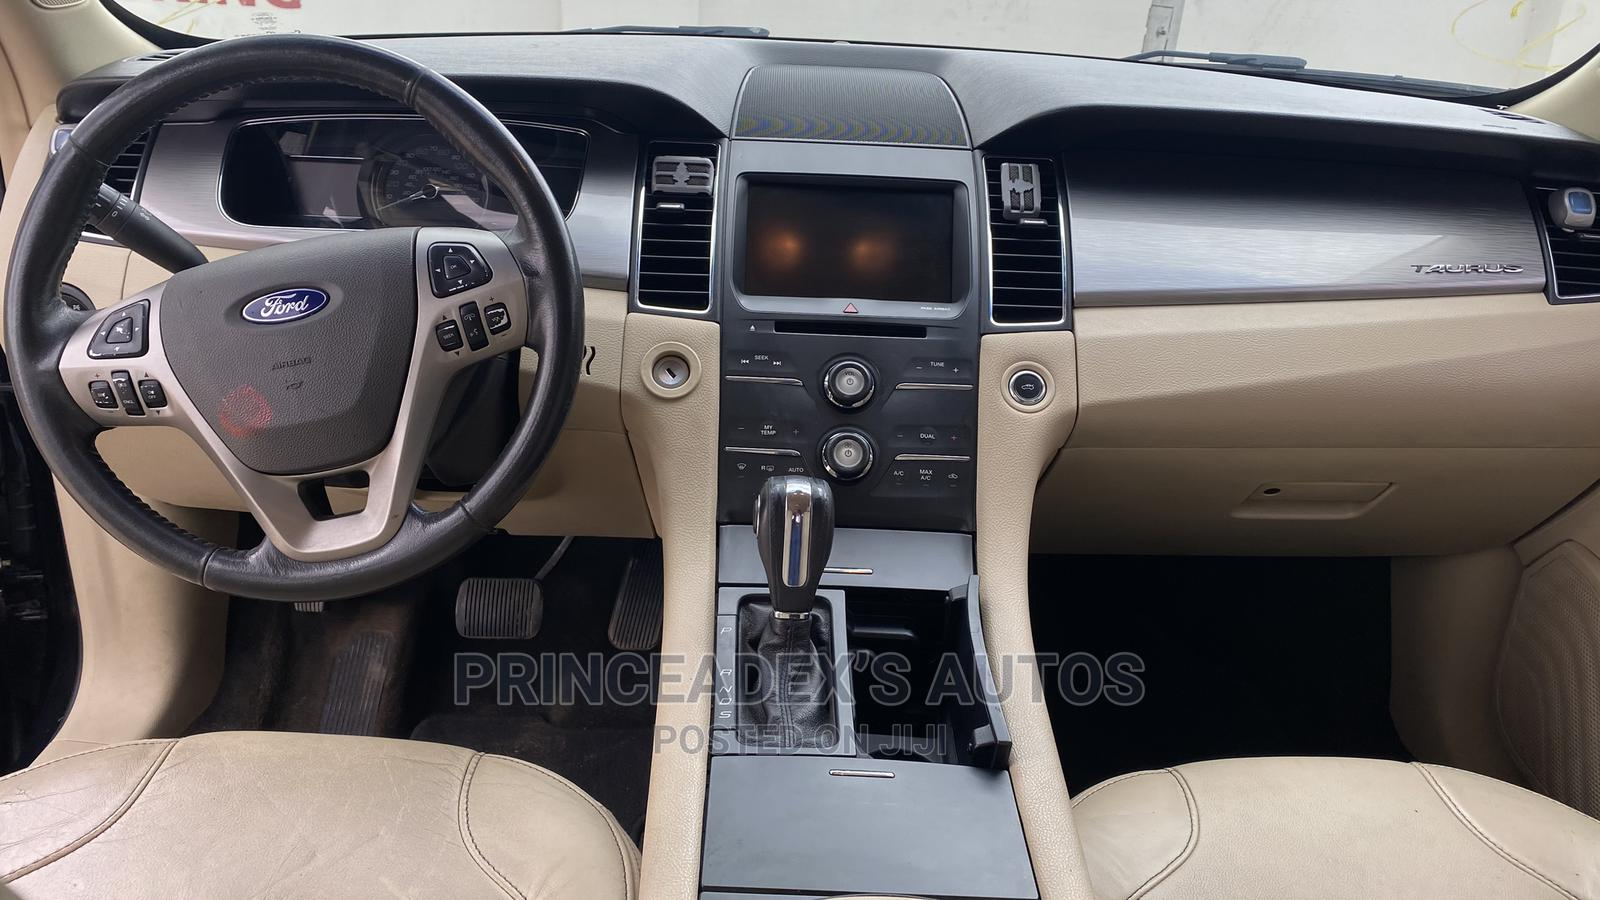 Ford Taurus 2013 SEL  Black   Cars for sale in Ibadan, Oyo State, Nigeria